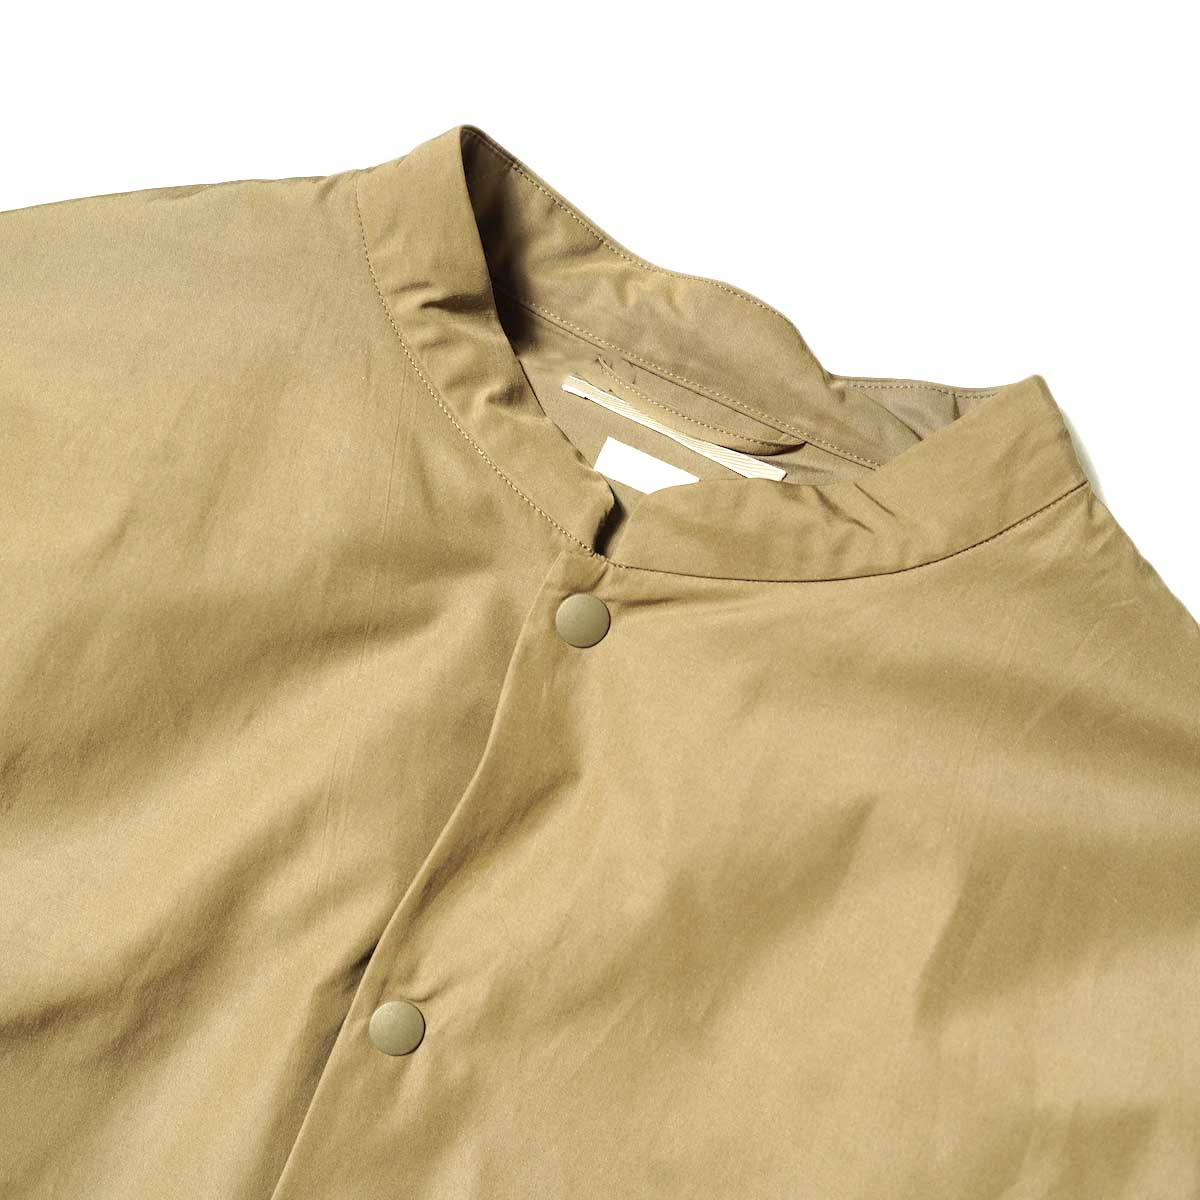 blurhms / Stand-up Collar Down Jacket (Khaki Beige) フロント